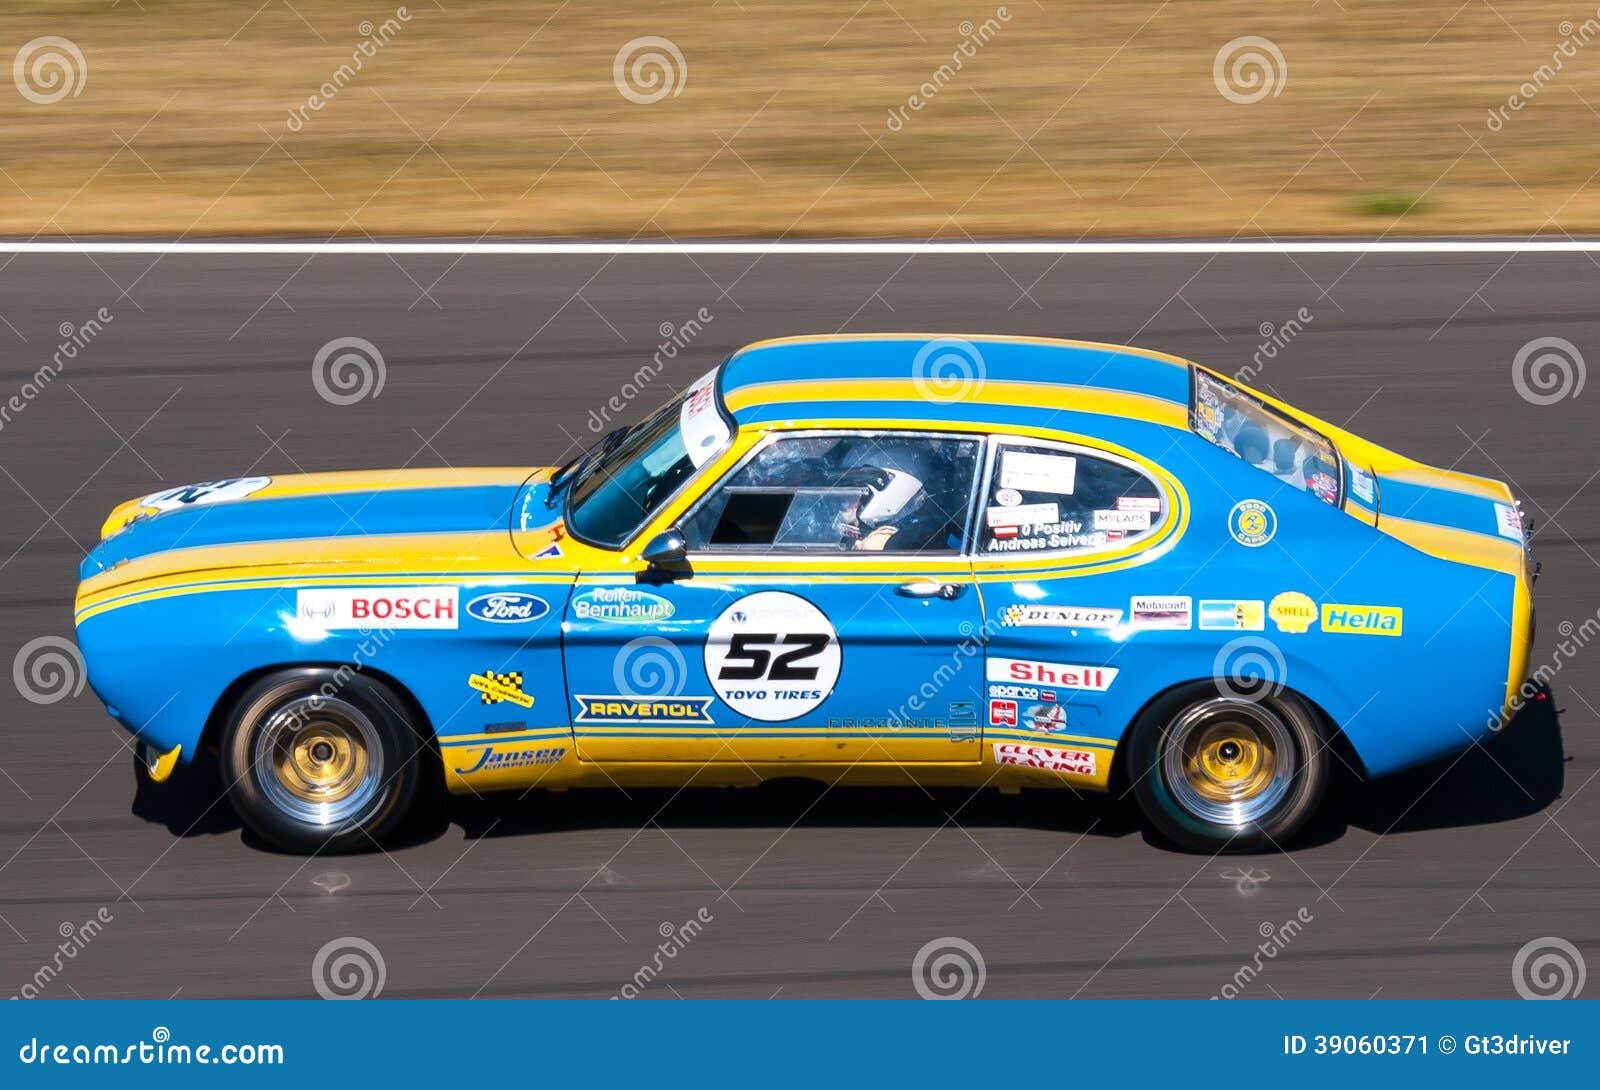 capri car classic ford histocup race ... & Classic Ford Capri Race Car Editorial Photo - Image: 39060371 markmcfarlin.com